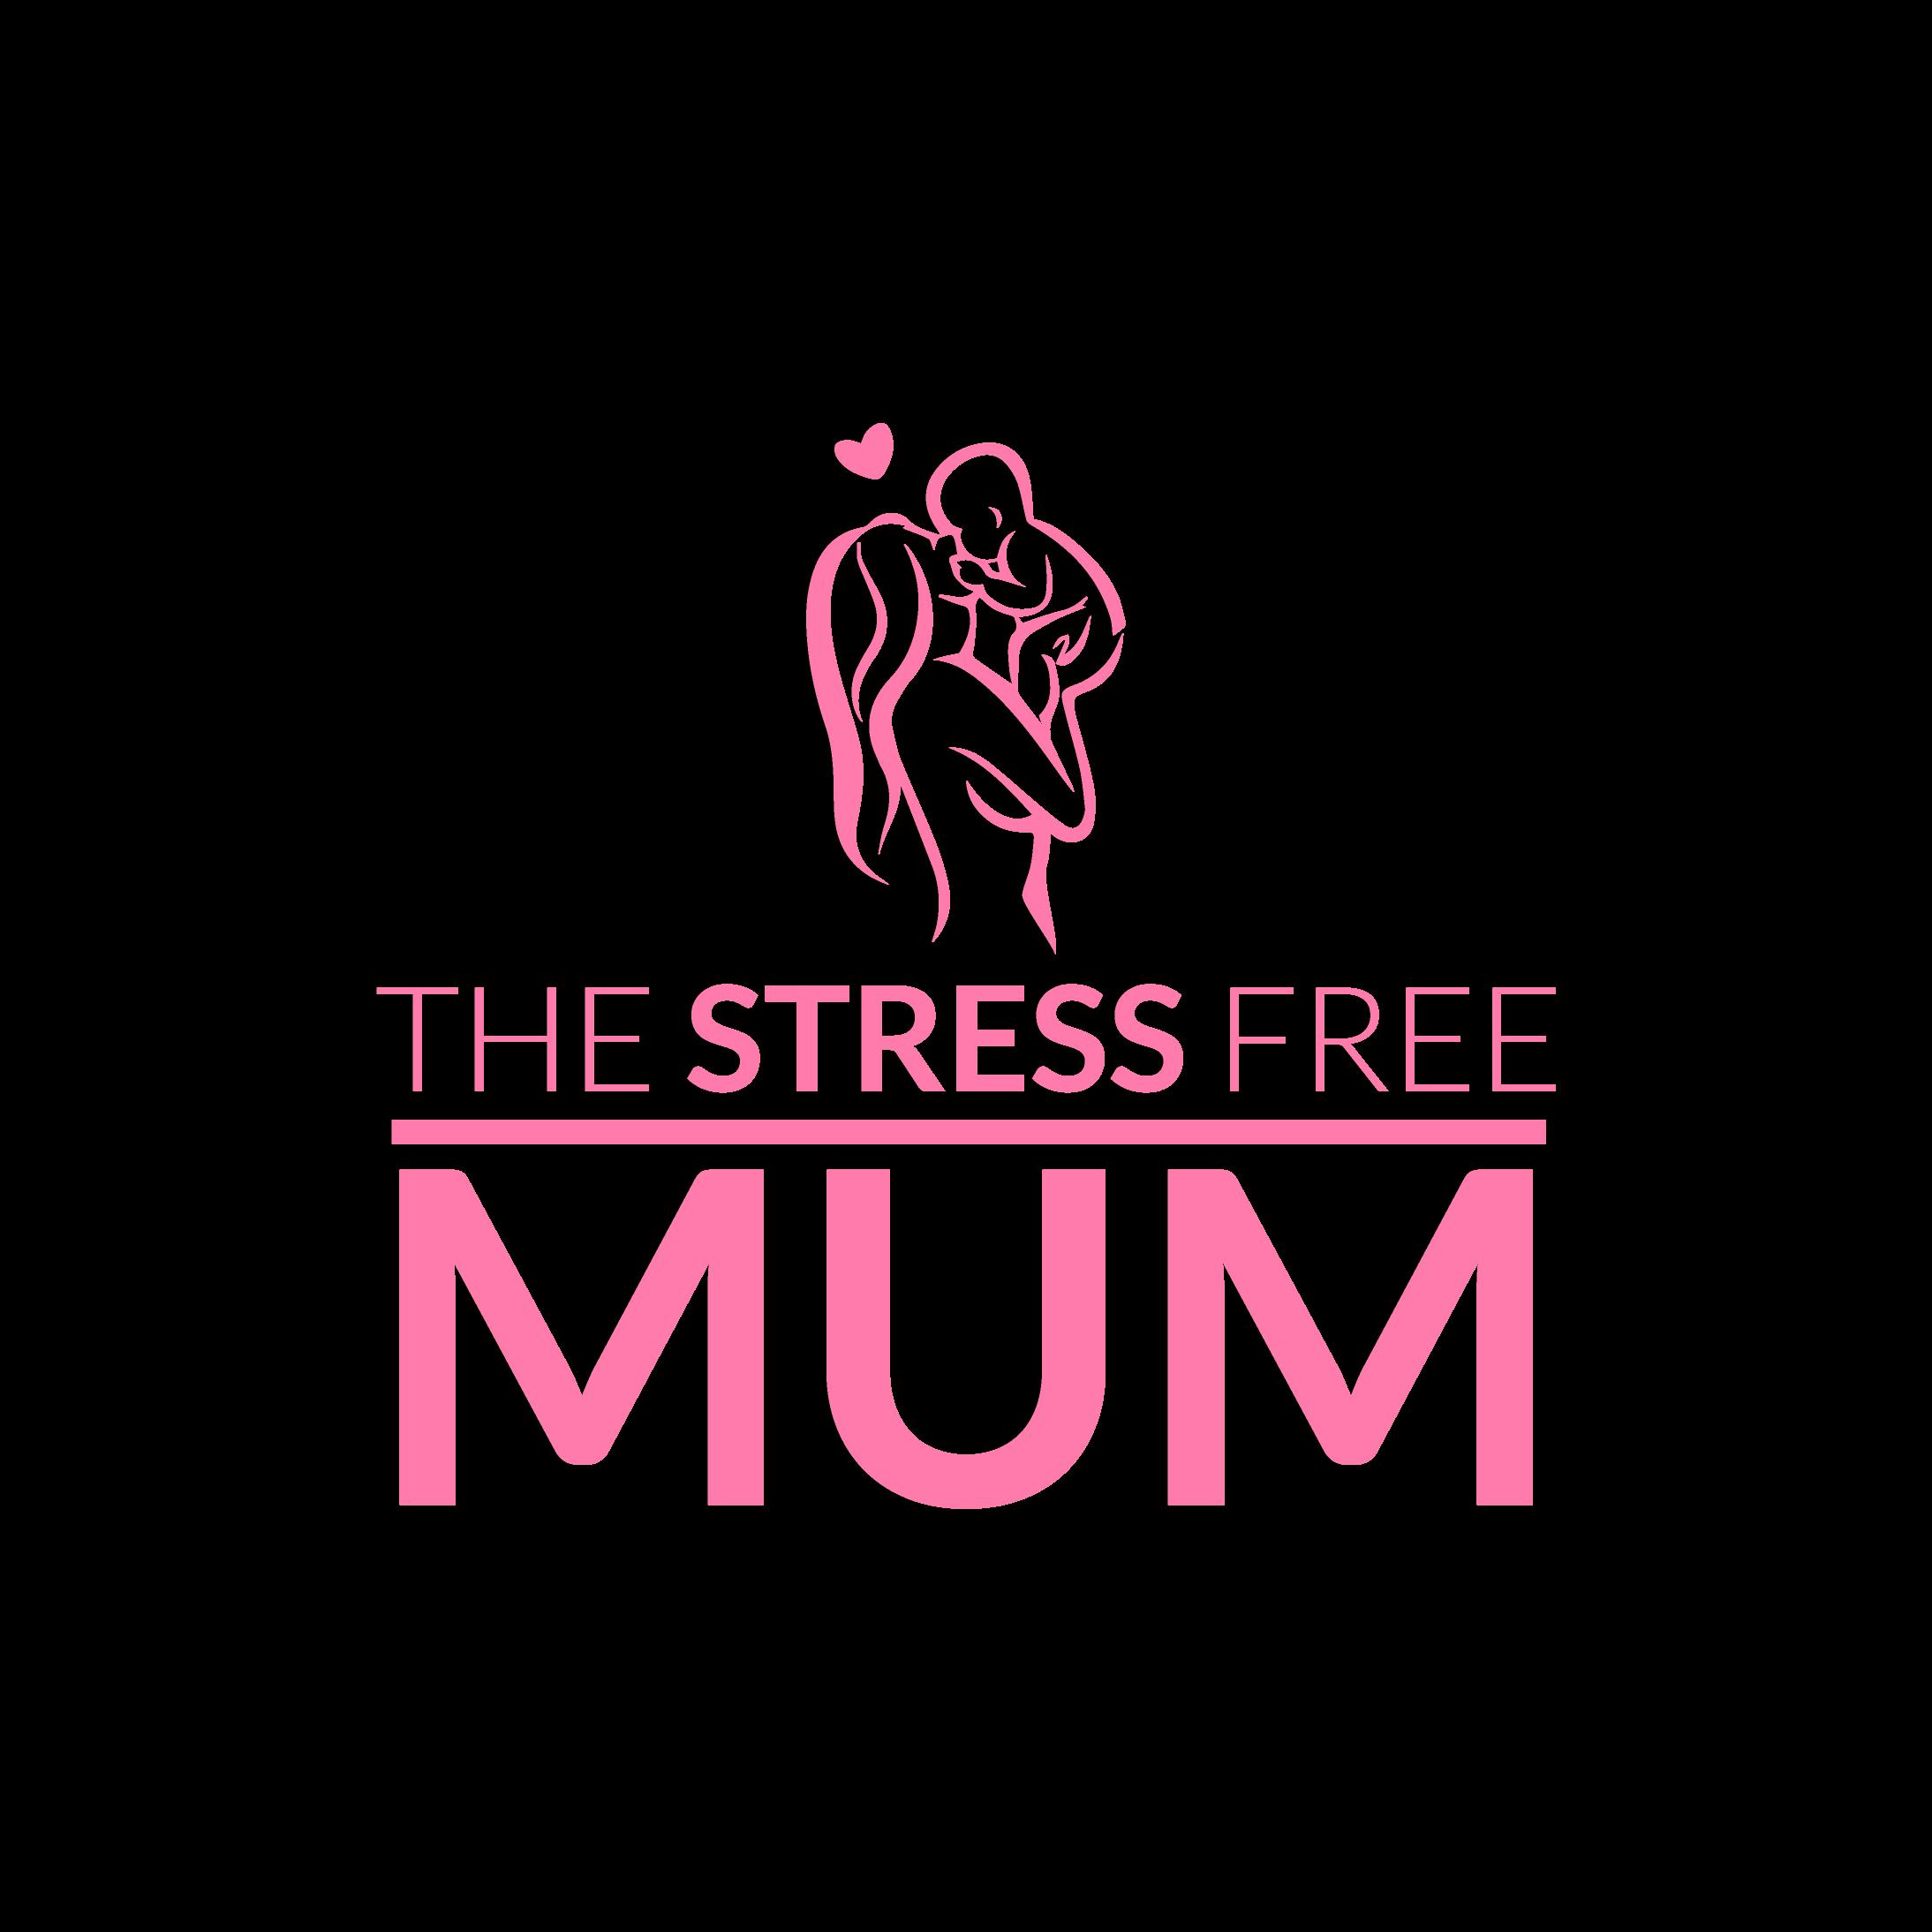 The Stress Free Mum